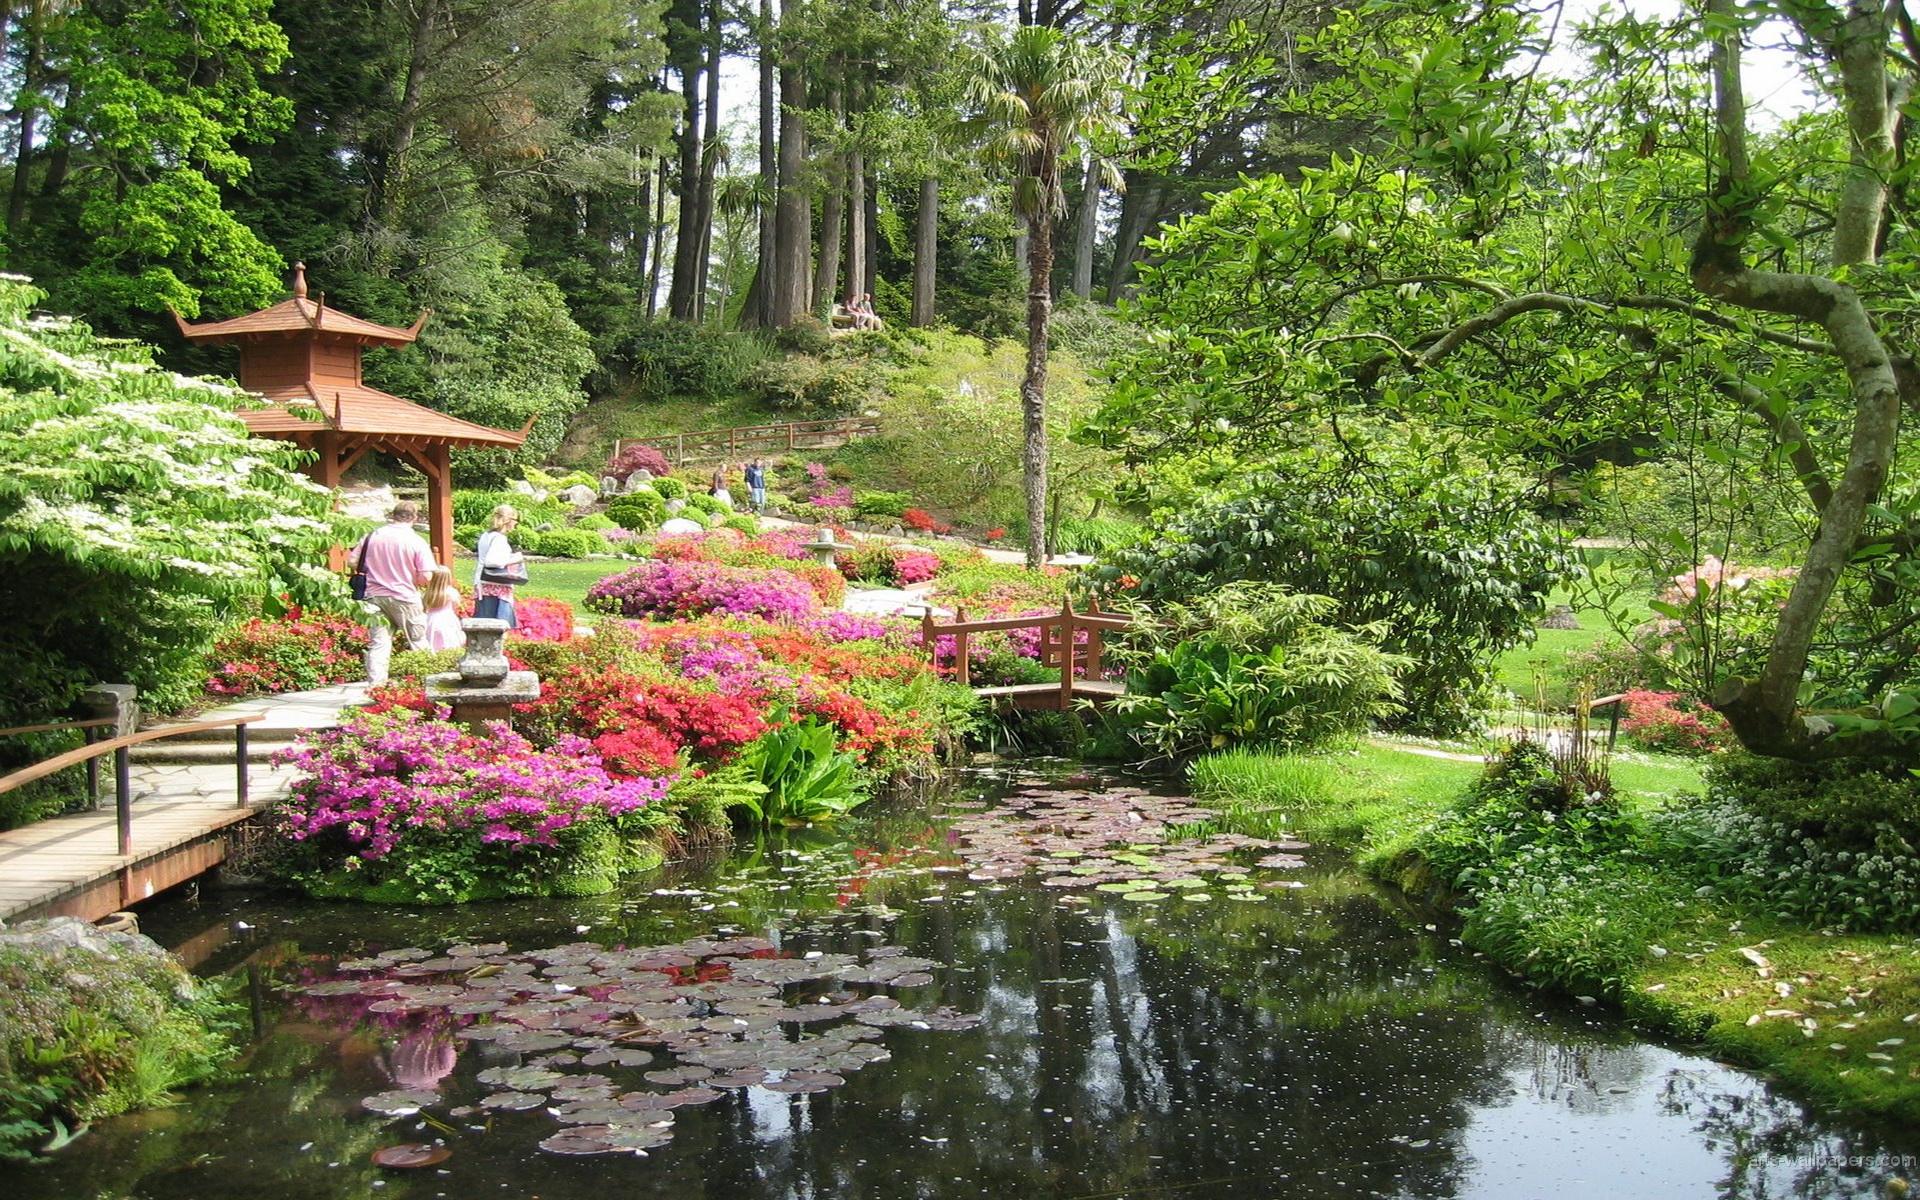 Japanese garden wallpaper -  Wallpaper Com Photo Japanese_garden_desktop_wallpaper 3 Html